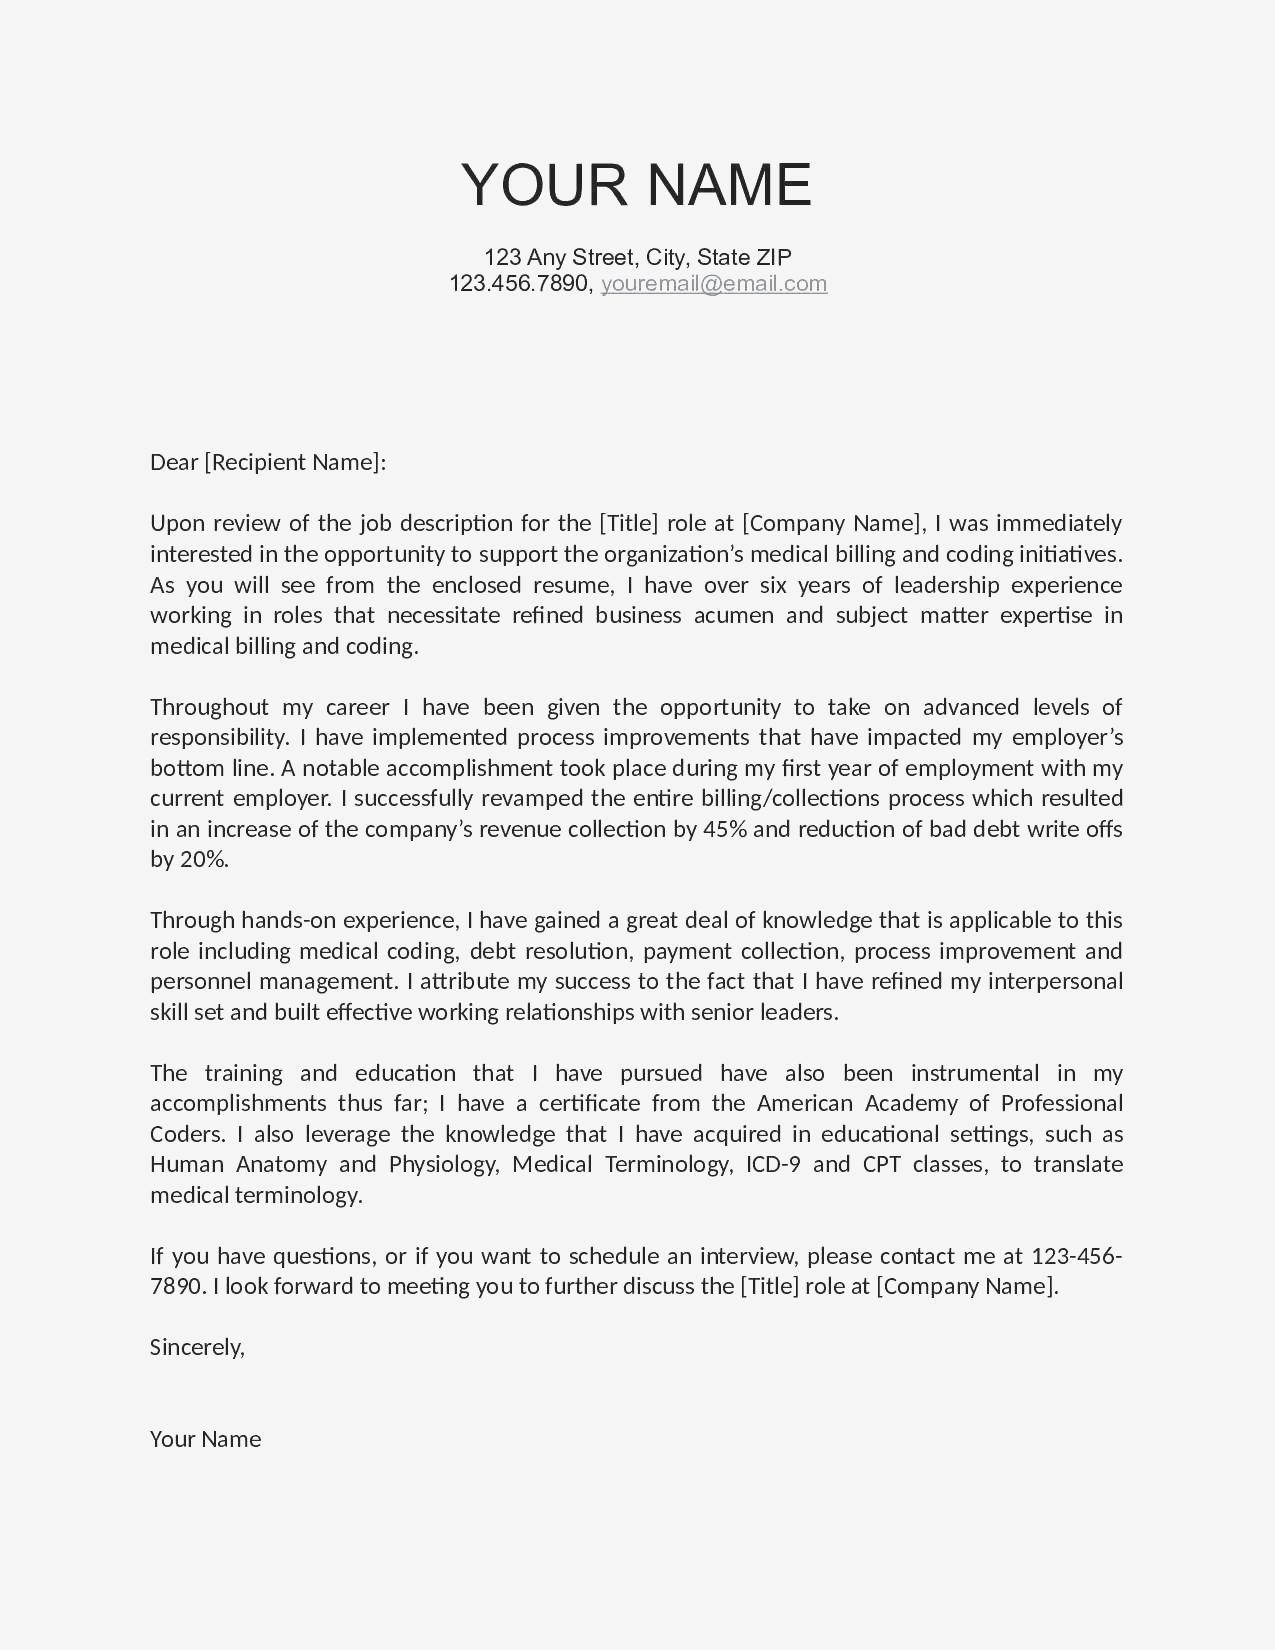 Free Cover Letter Template Australia